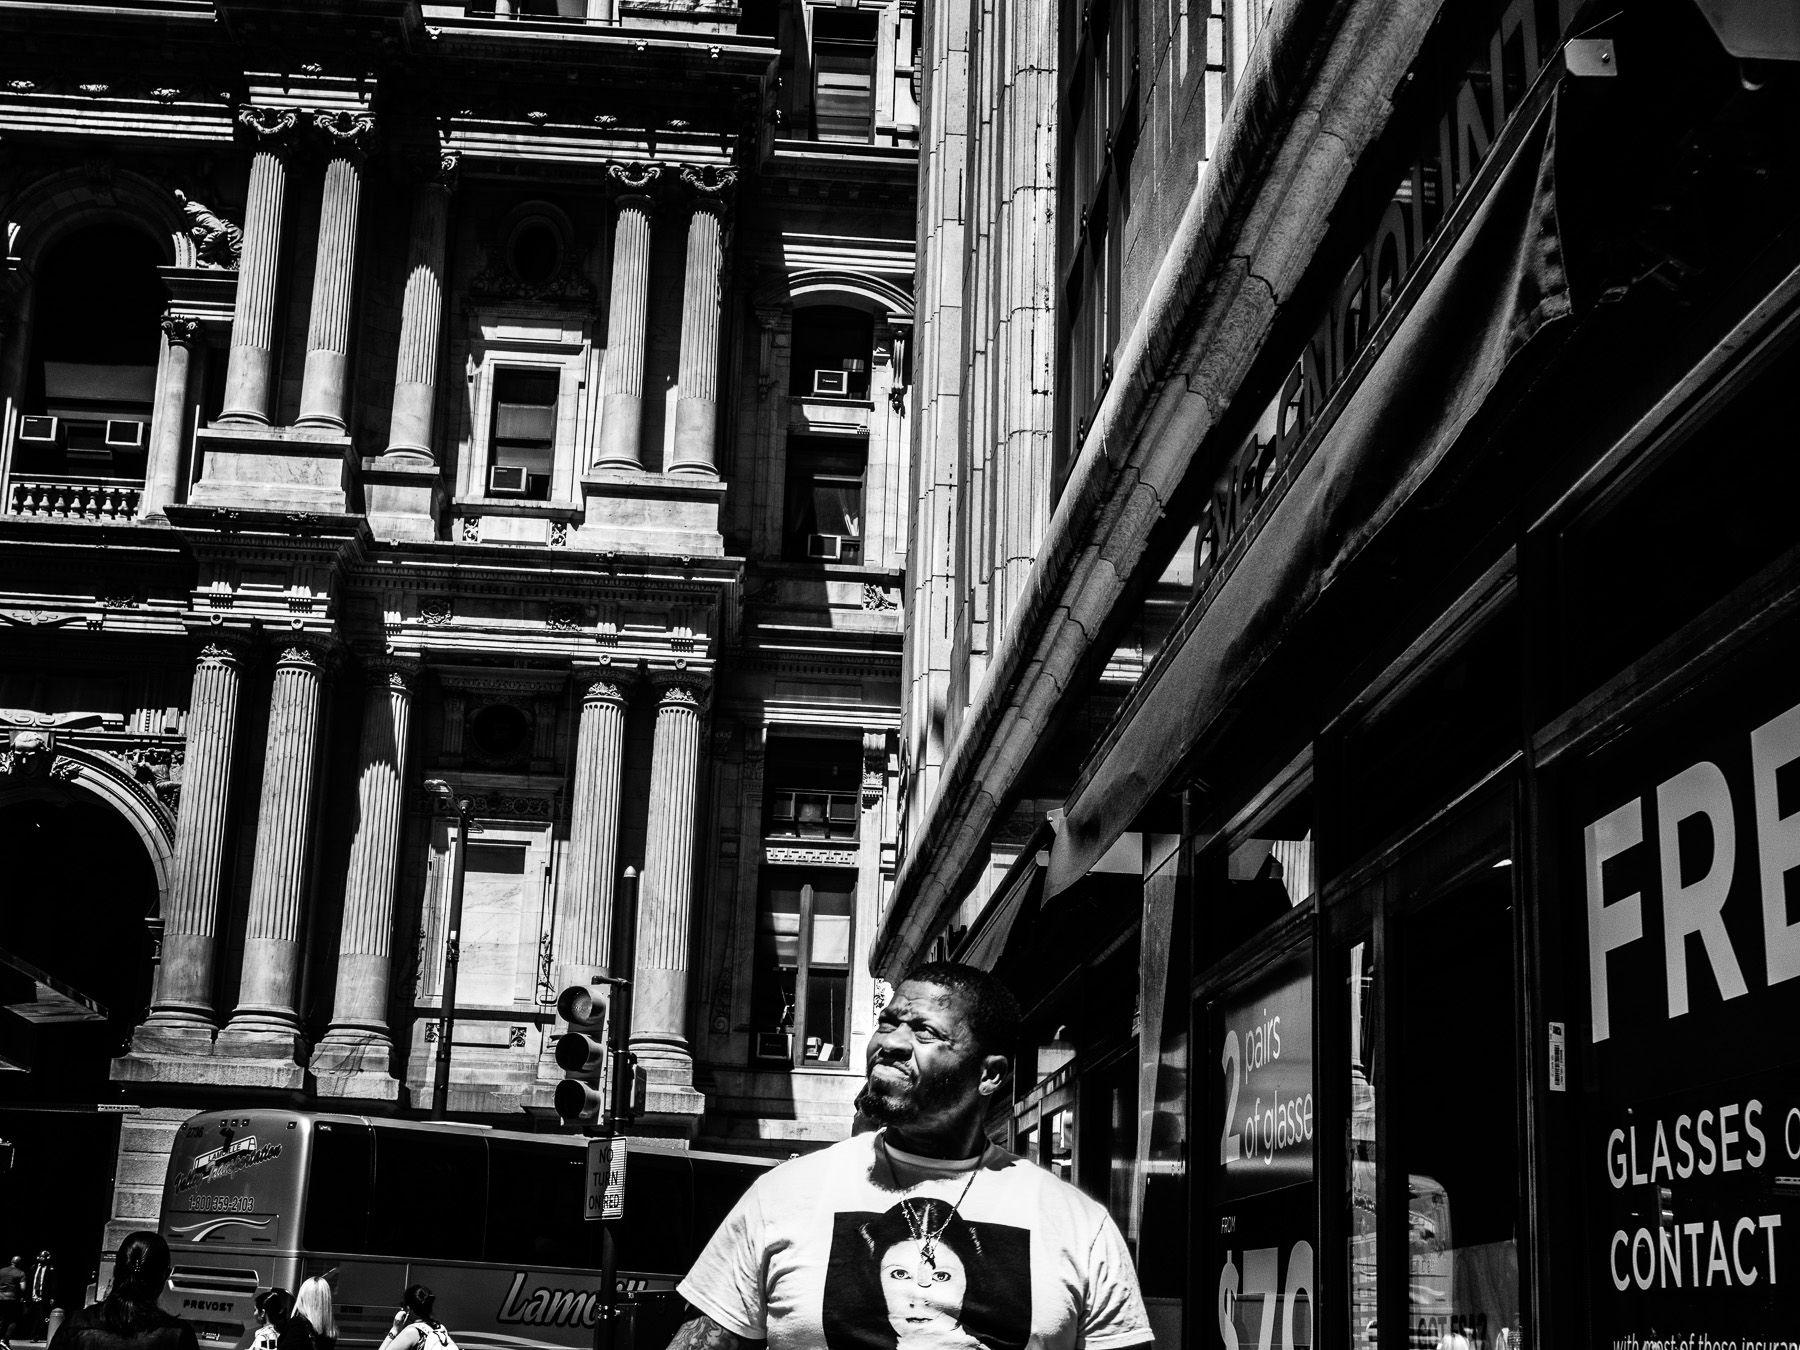 Market Street, Philadelphia, PA, 2018